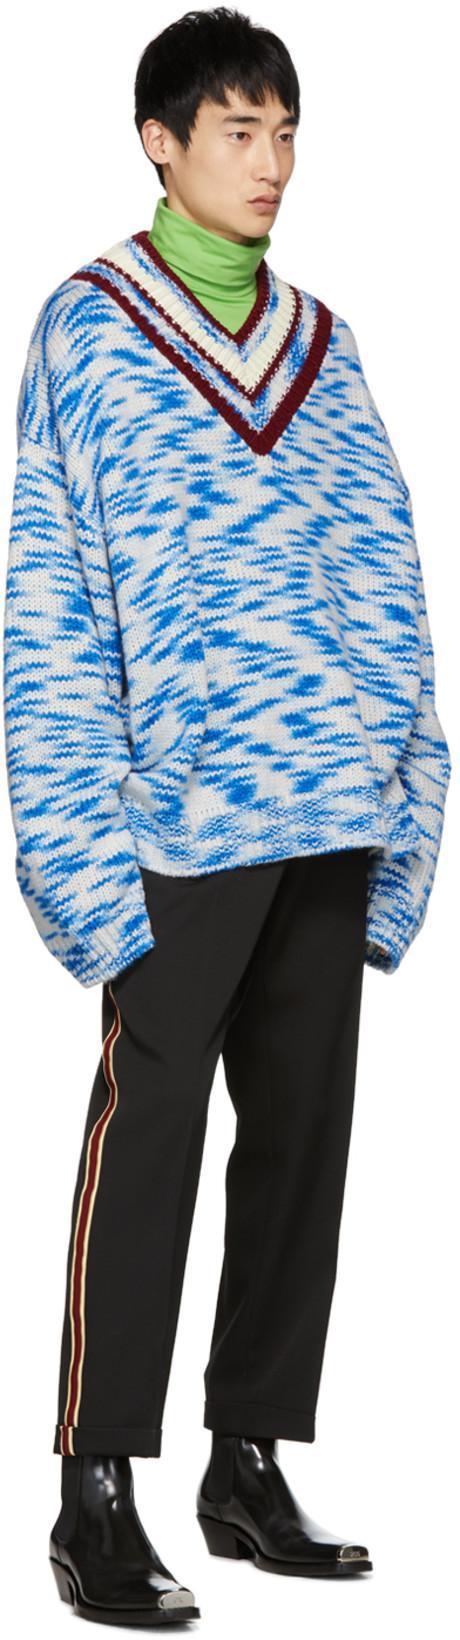 5903337188 CALVIN KLEIN 205W39NYC Calvin Klein 205W39Nyc Oversized V-Neck Printed  Sweater - Multicolour